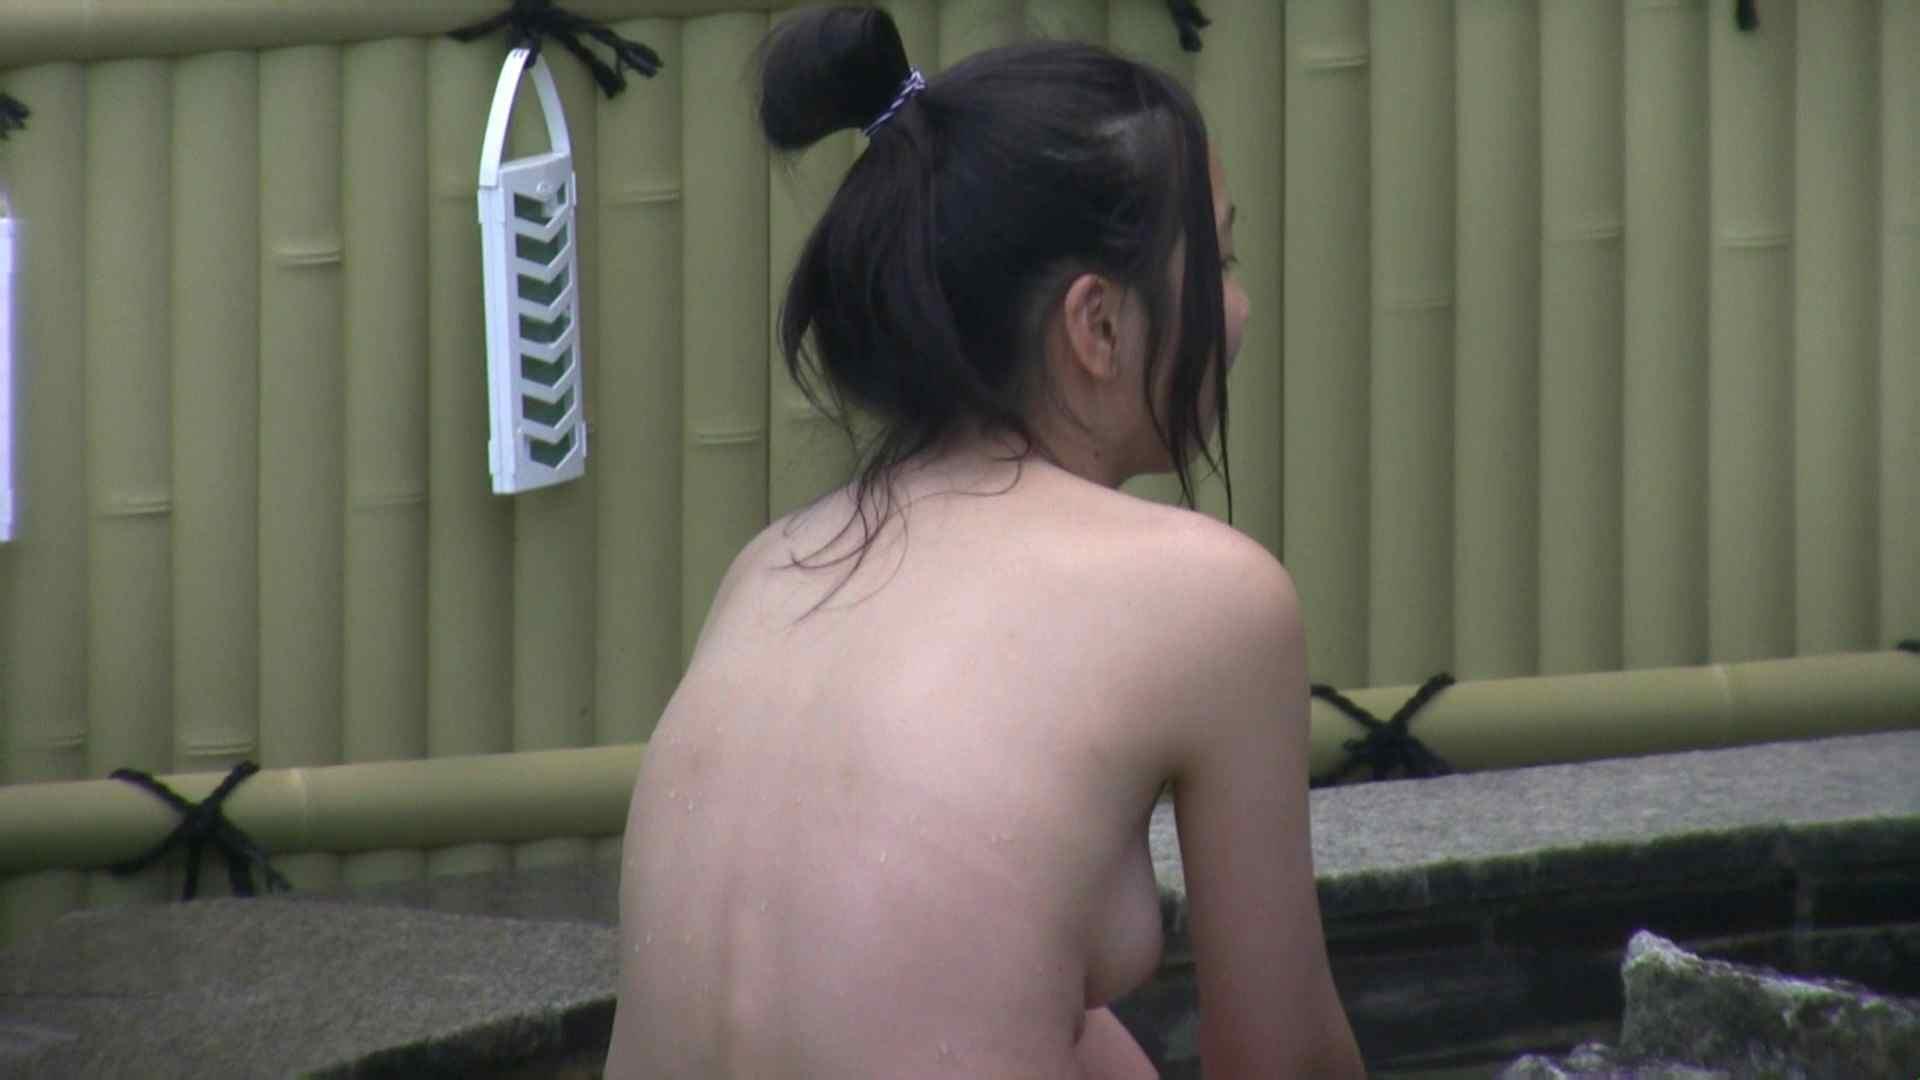 Aquaな露天風呂Vol.87【VIP限定】 0 | 0  15連発 15